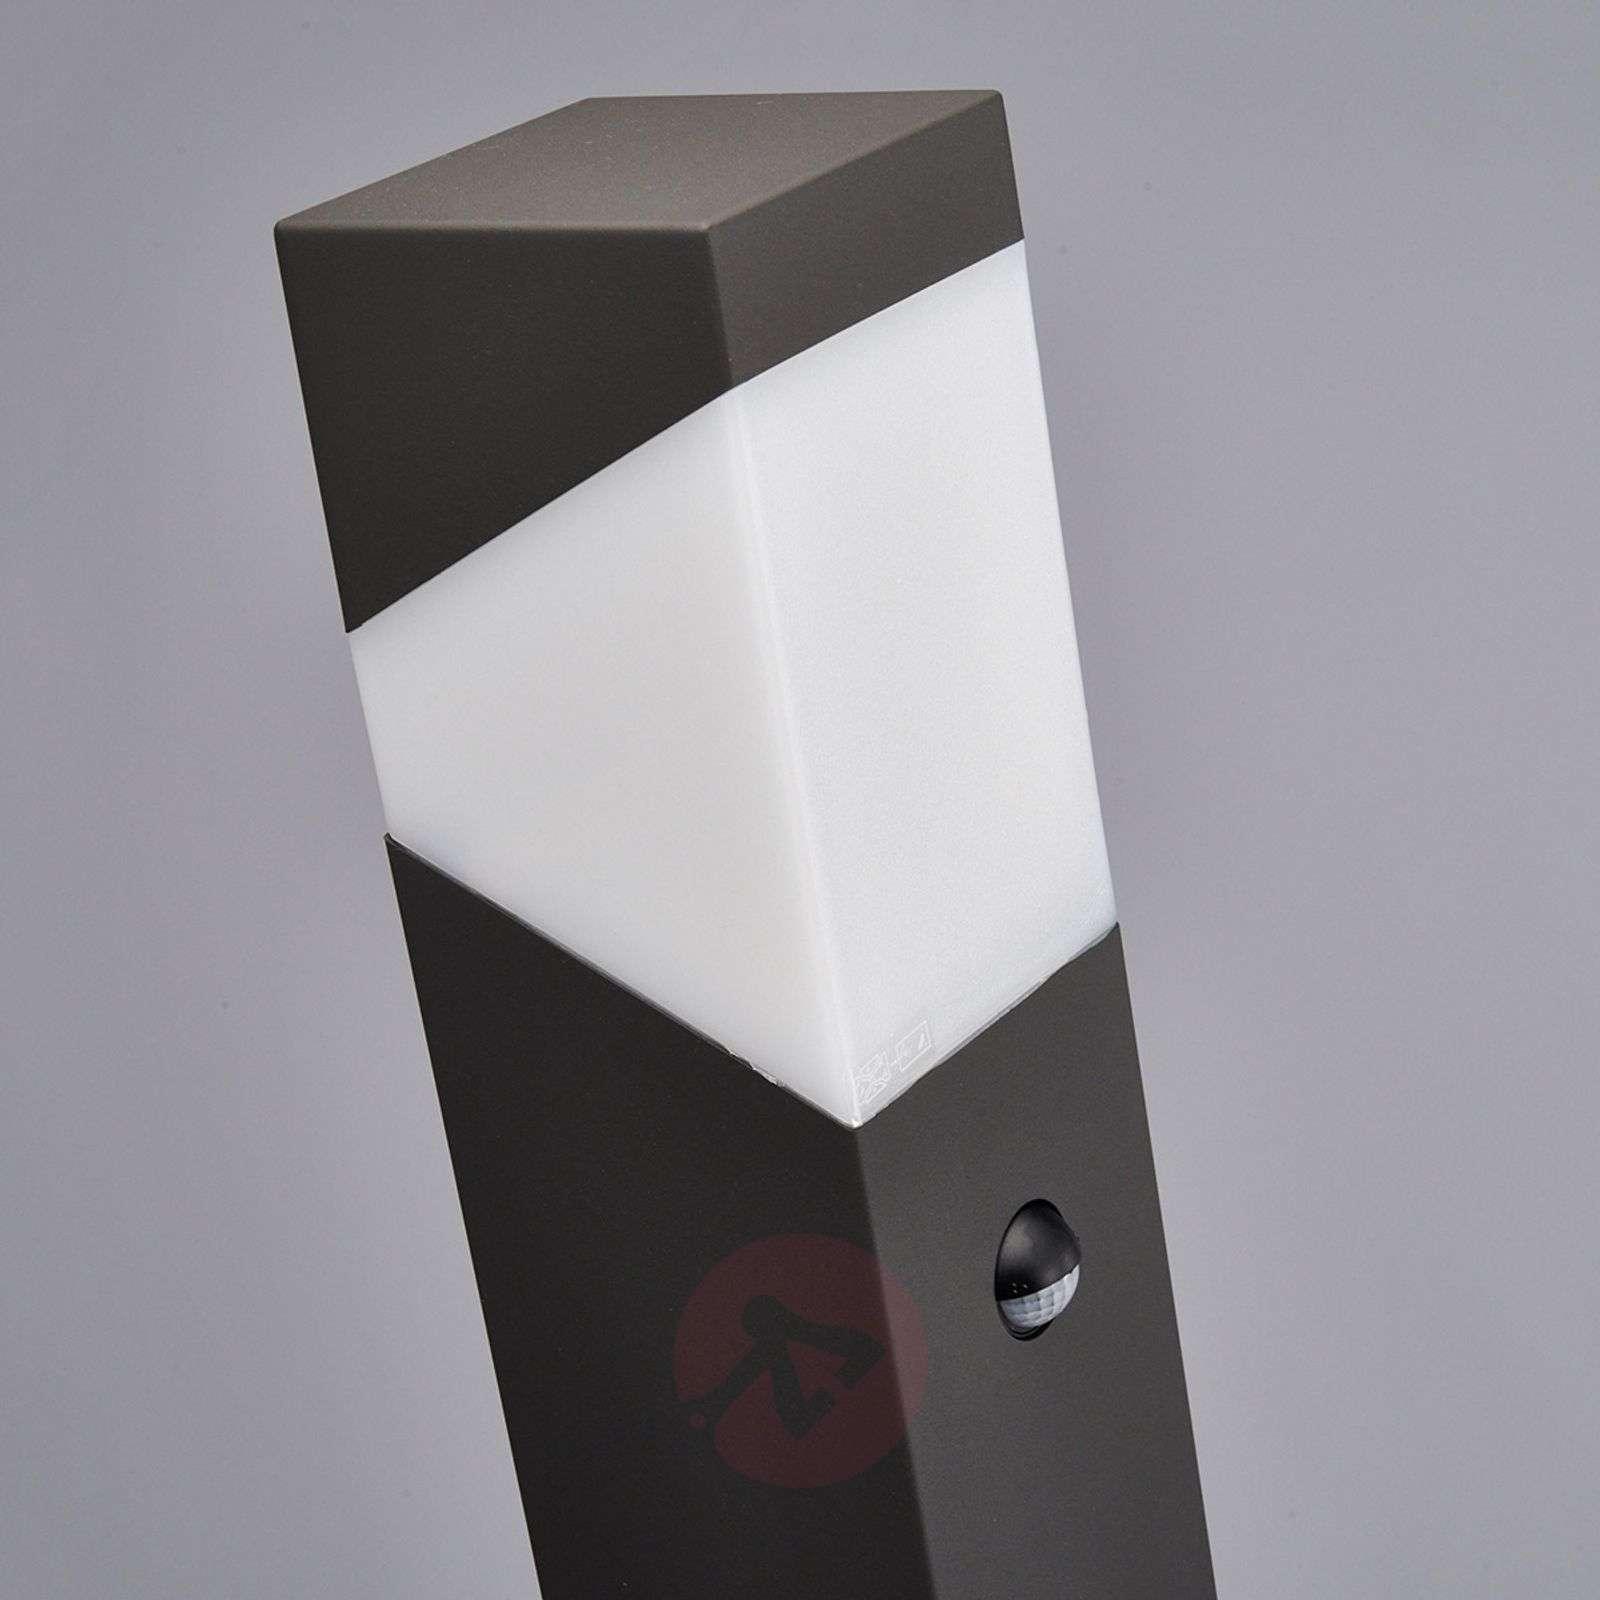 Kiran LED Path Lamp with Motion Detector-9619016-04